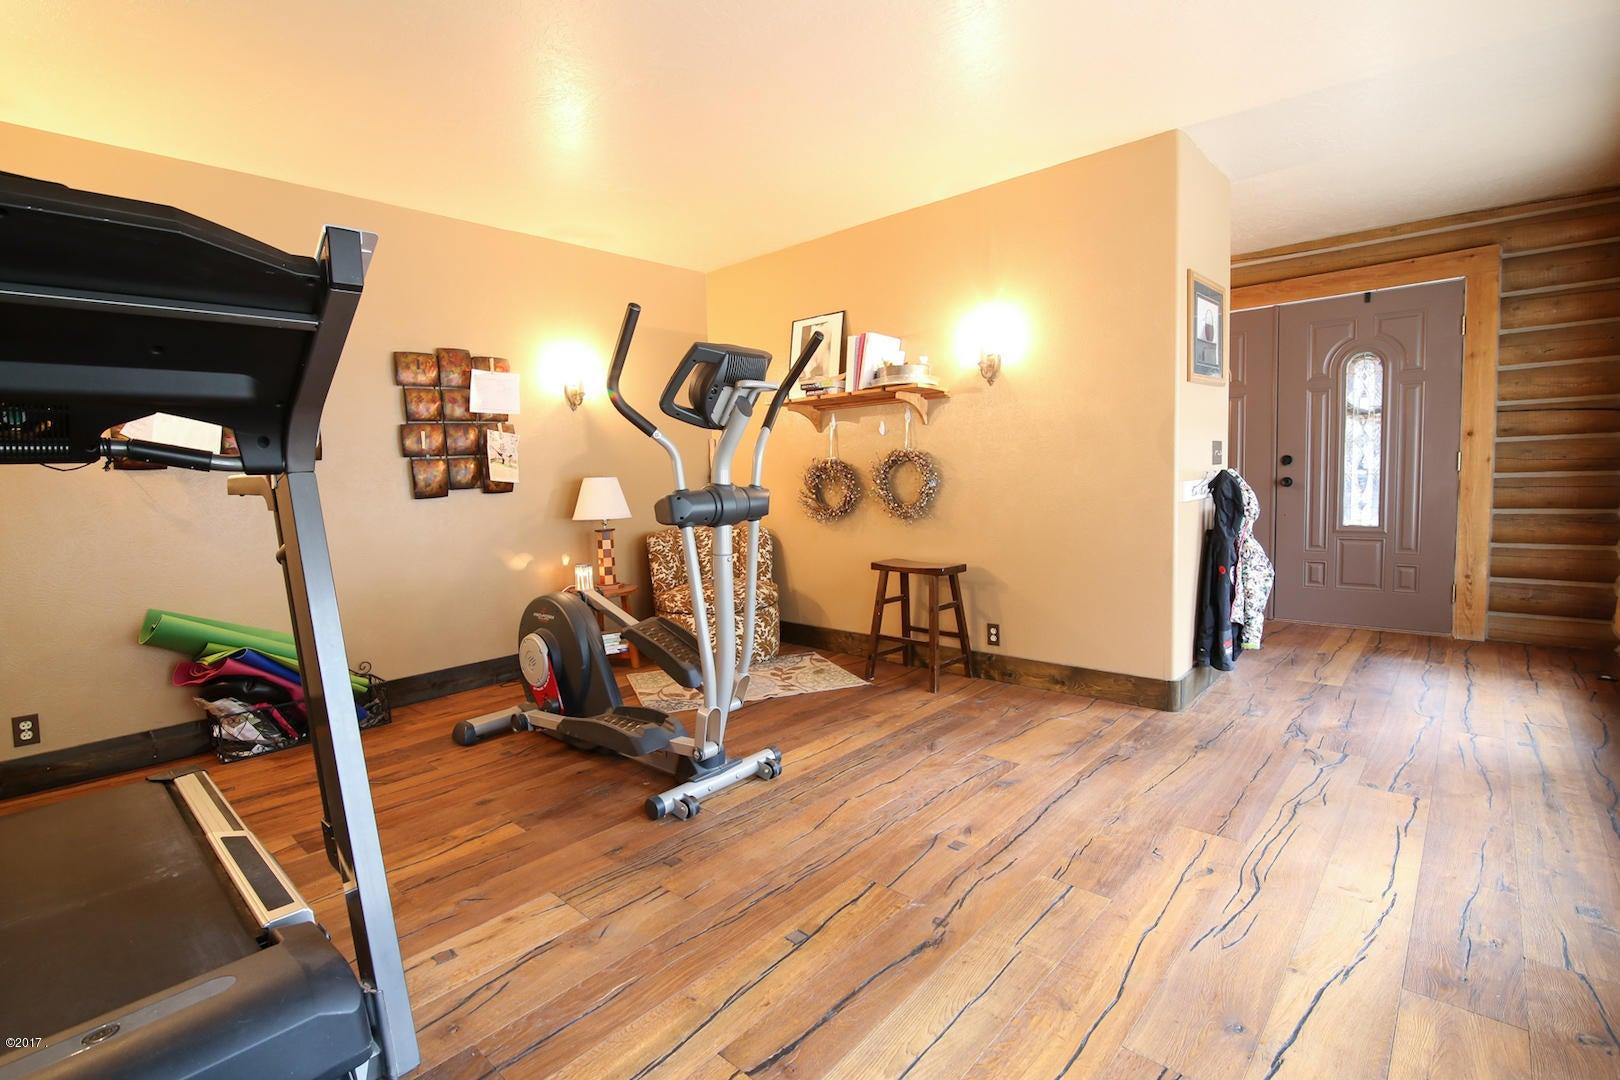 Additional photo for property listing at 23405 Wapiti Road 23405 Wapiti Road Huson, Montana 59846 United States